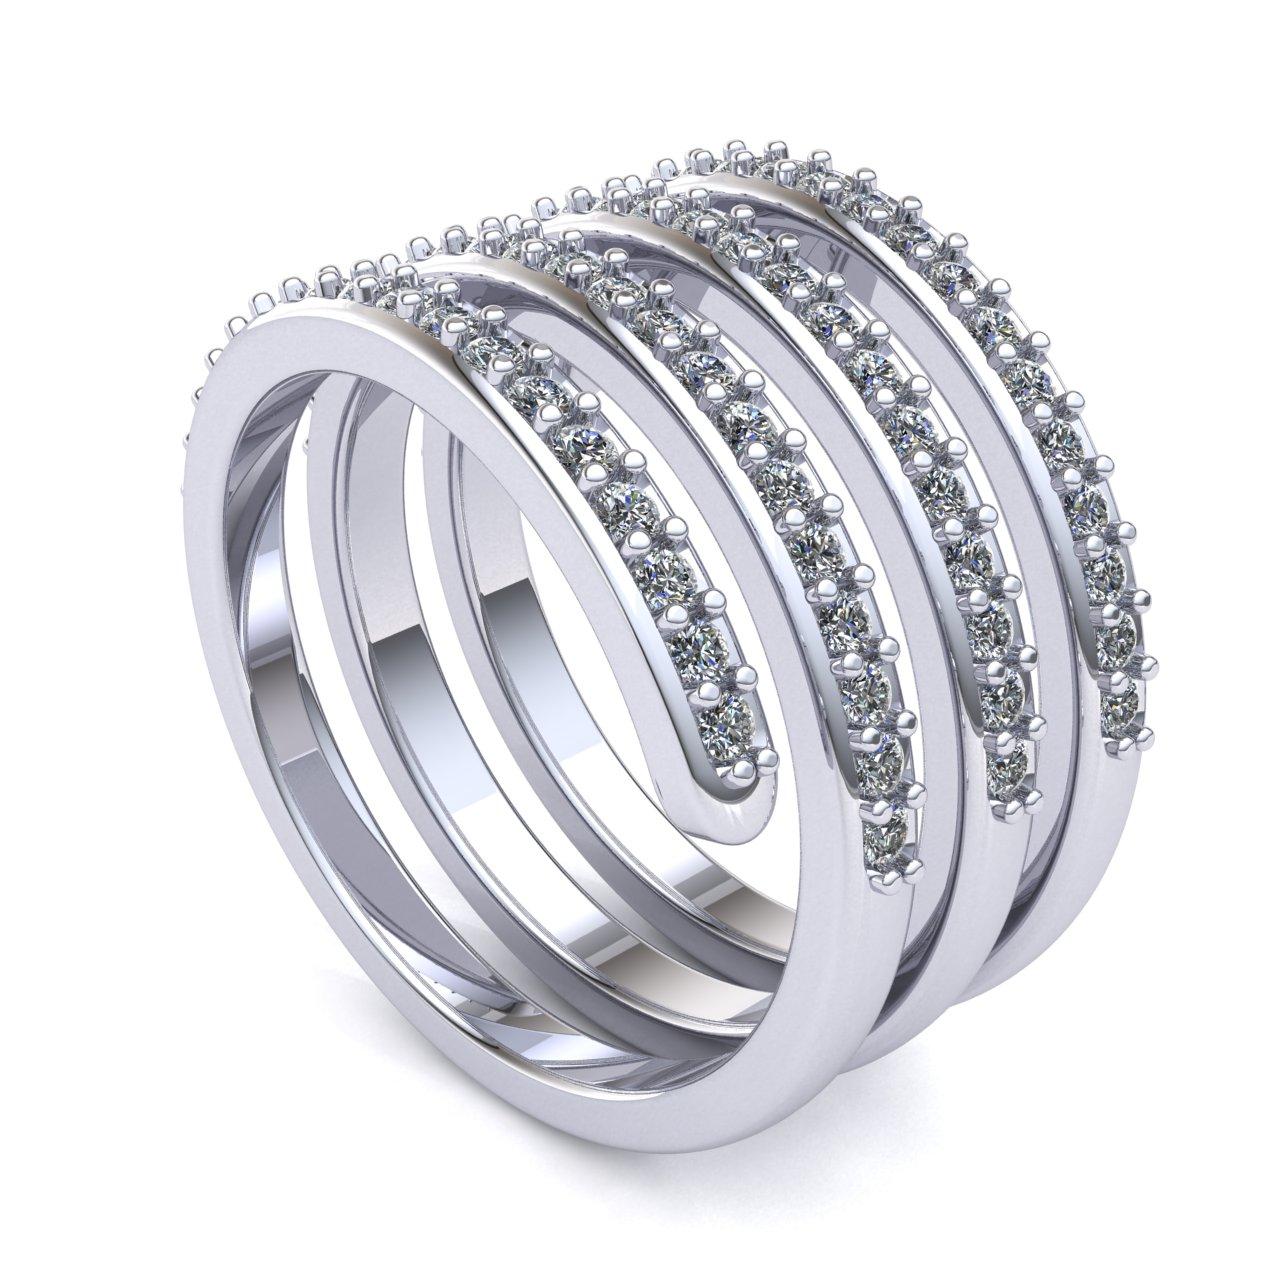 Genuine 0 75ct Round Cut Diamond Fancy Swirl Wedding Band Ring Solid